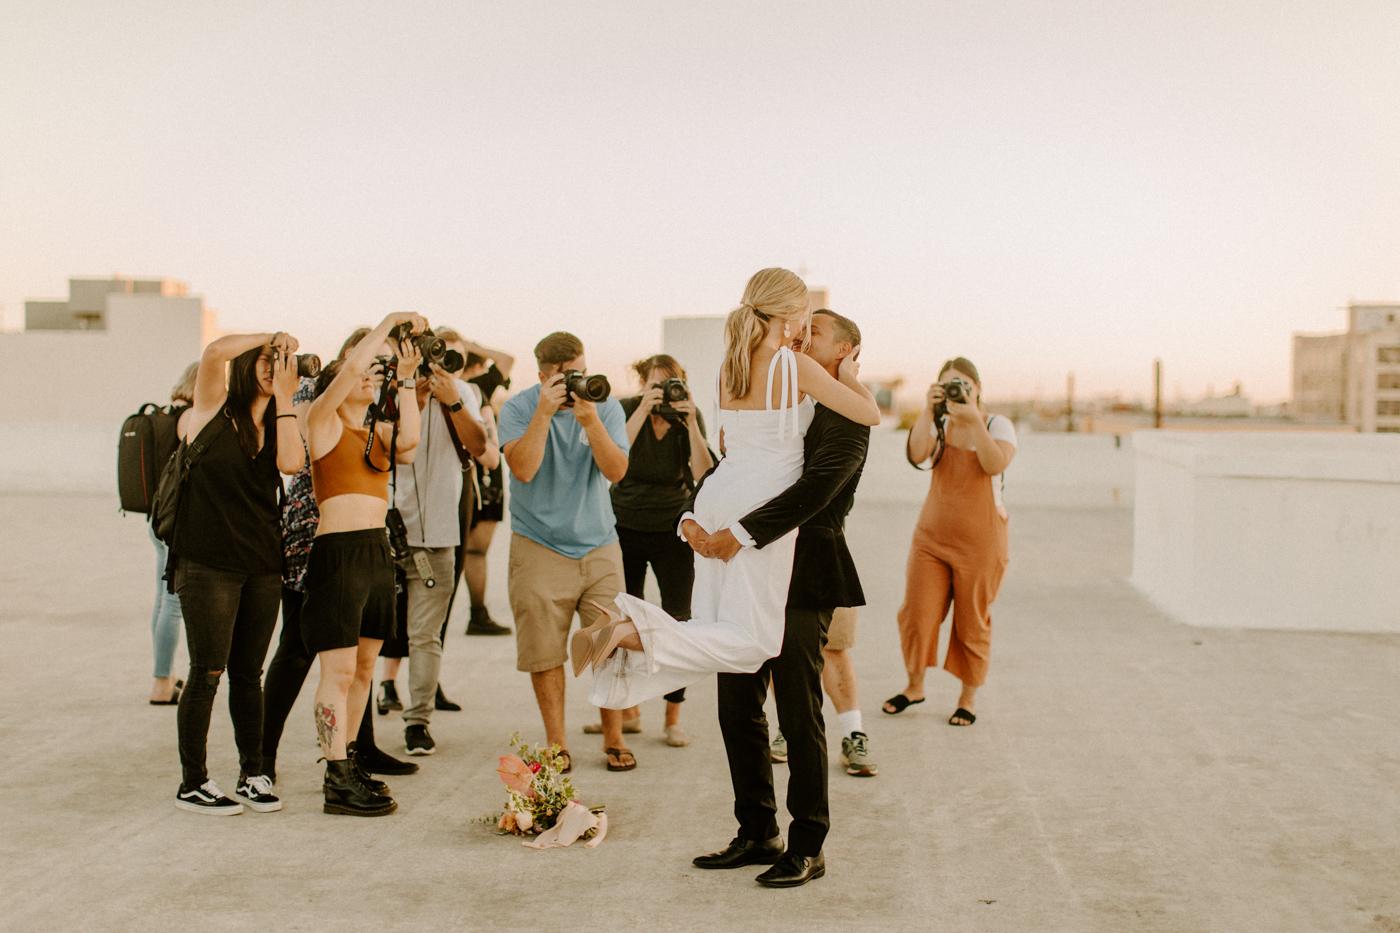 Brianna Broyles Photography - The Shootout Society- Rooftop Modern Wedding-195.jpg